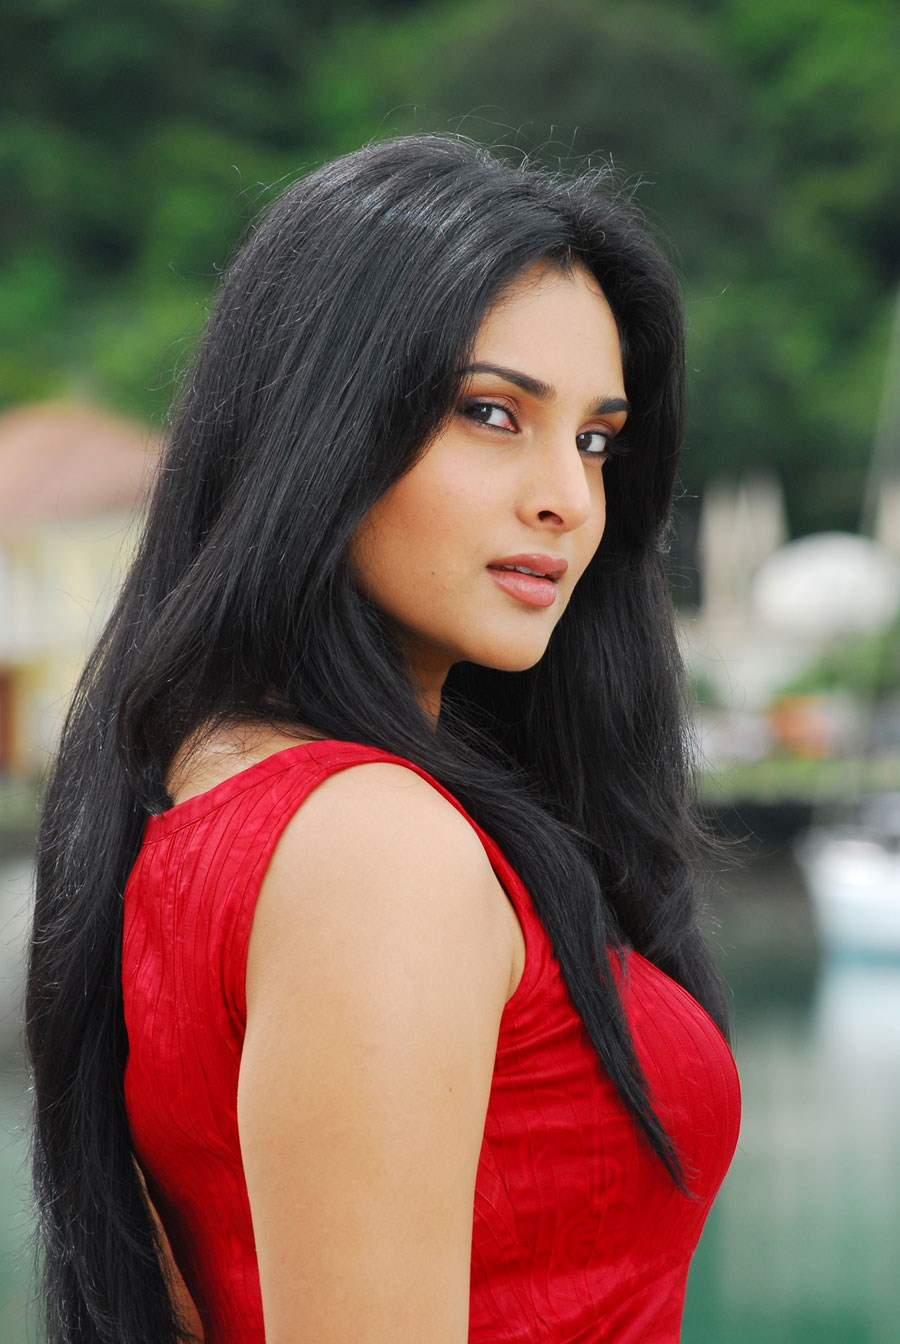 kannada actress hd wallpapers of ramya